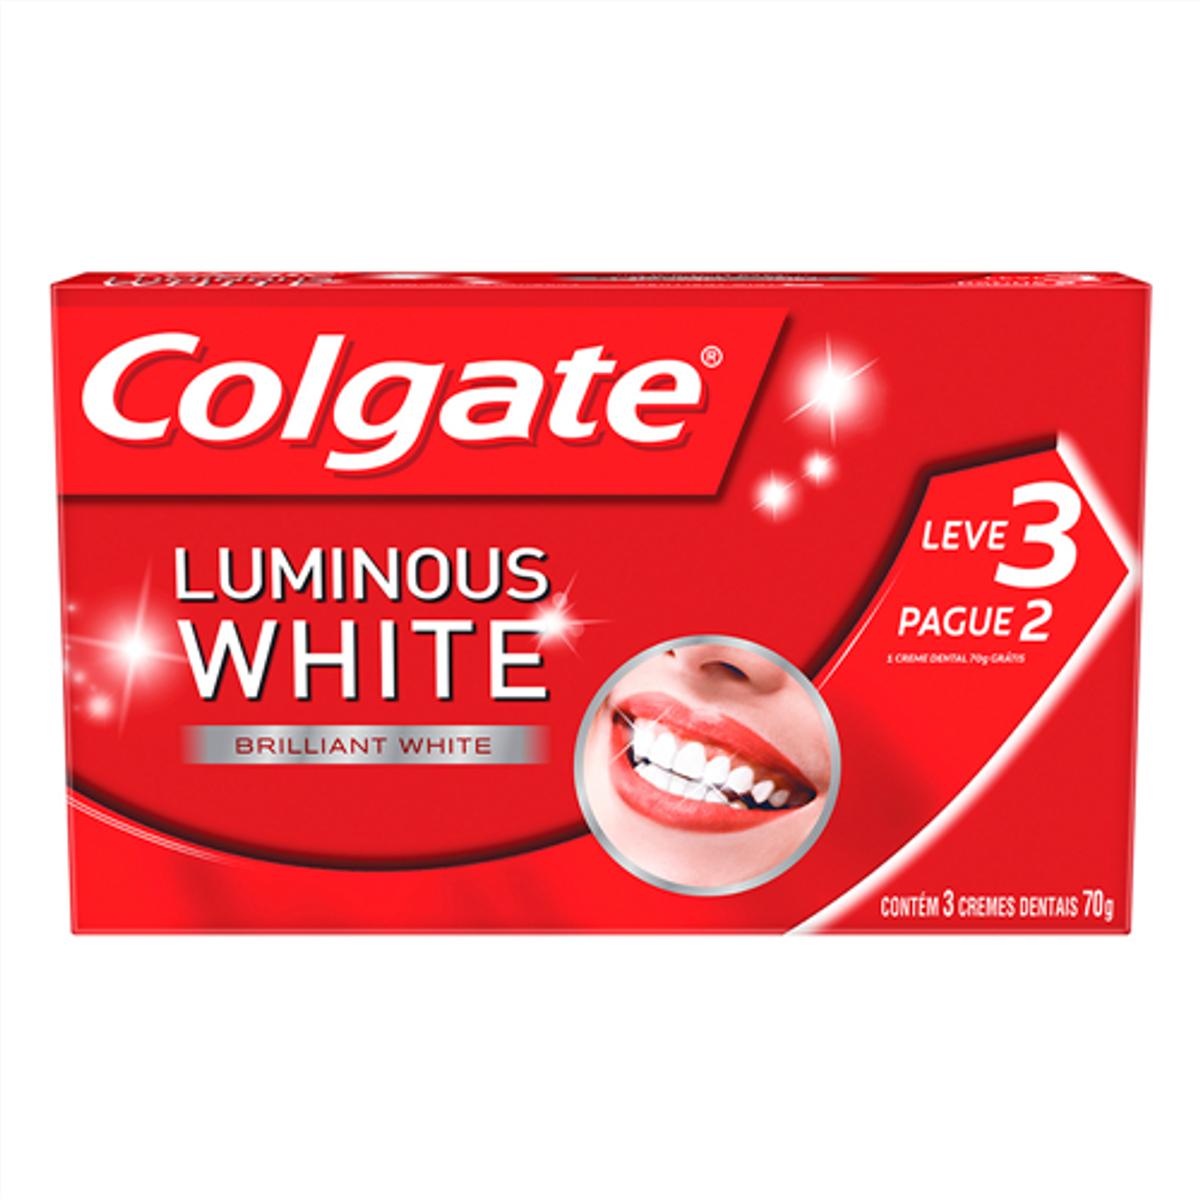 Creme Dental Branqueador Colgate Luminous White 70g Promo Leve 3 Pague 2